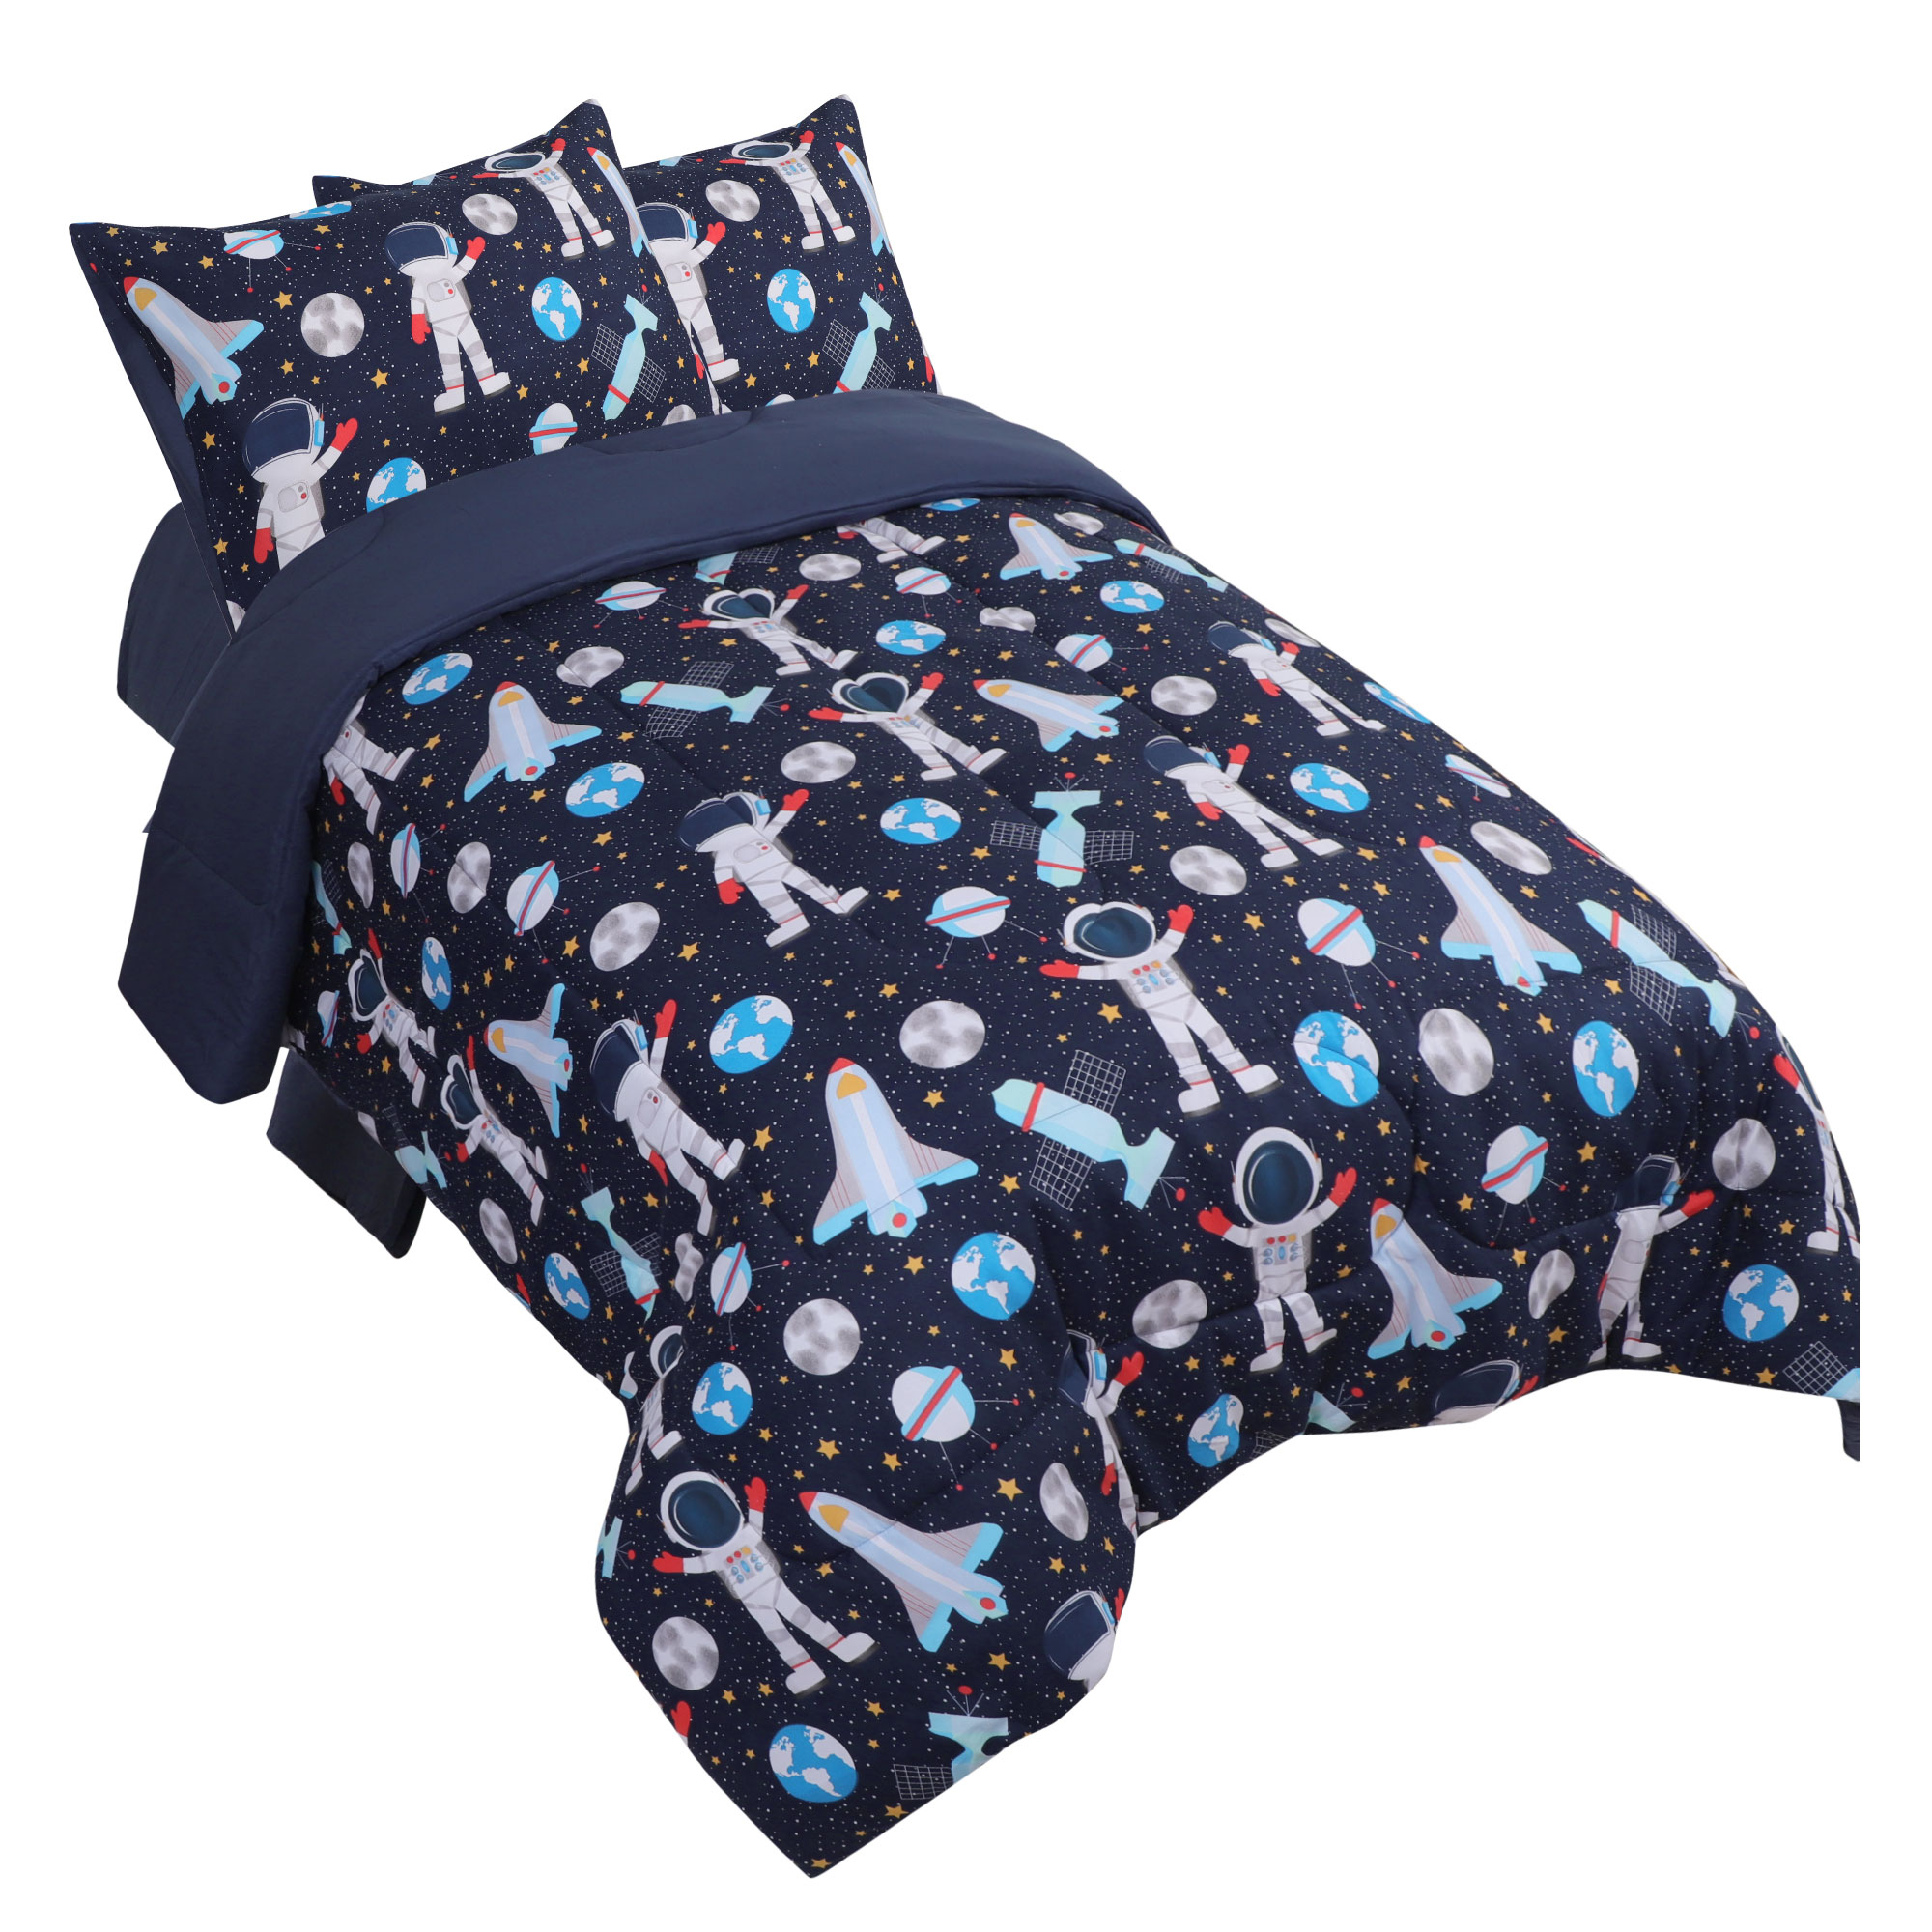 5 Piece Polyester Microfiber Kids Bed Comforter Set Full Space Astronaut